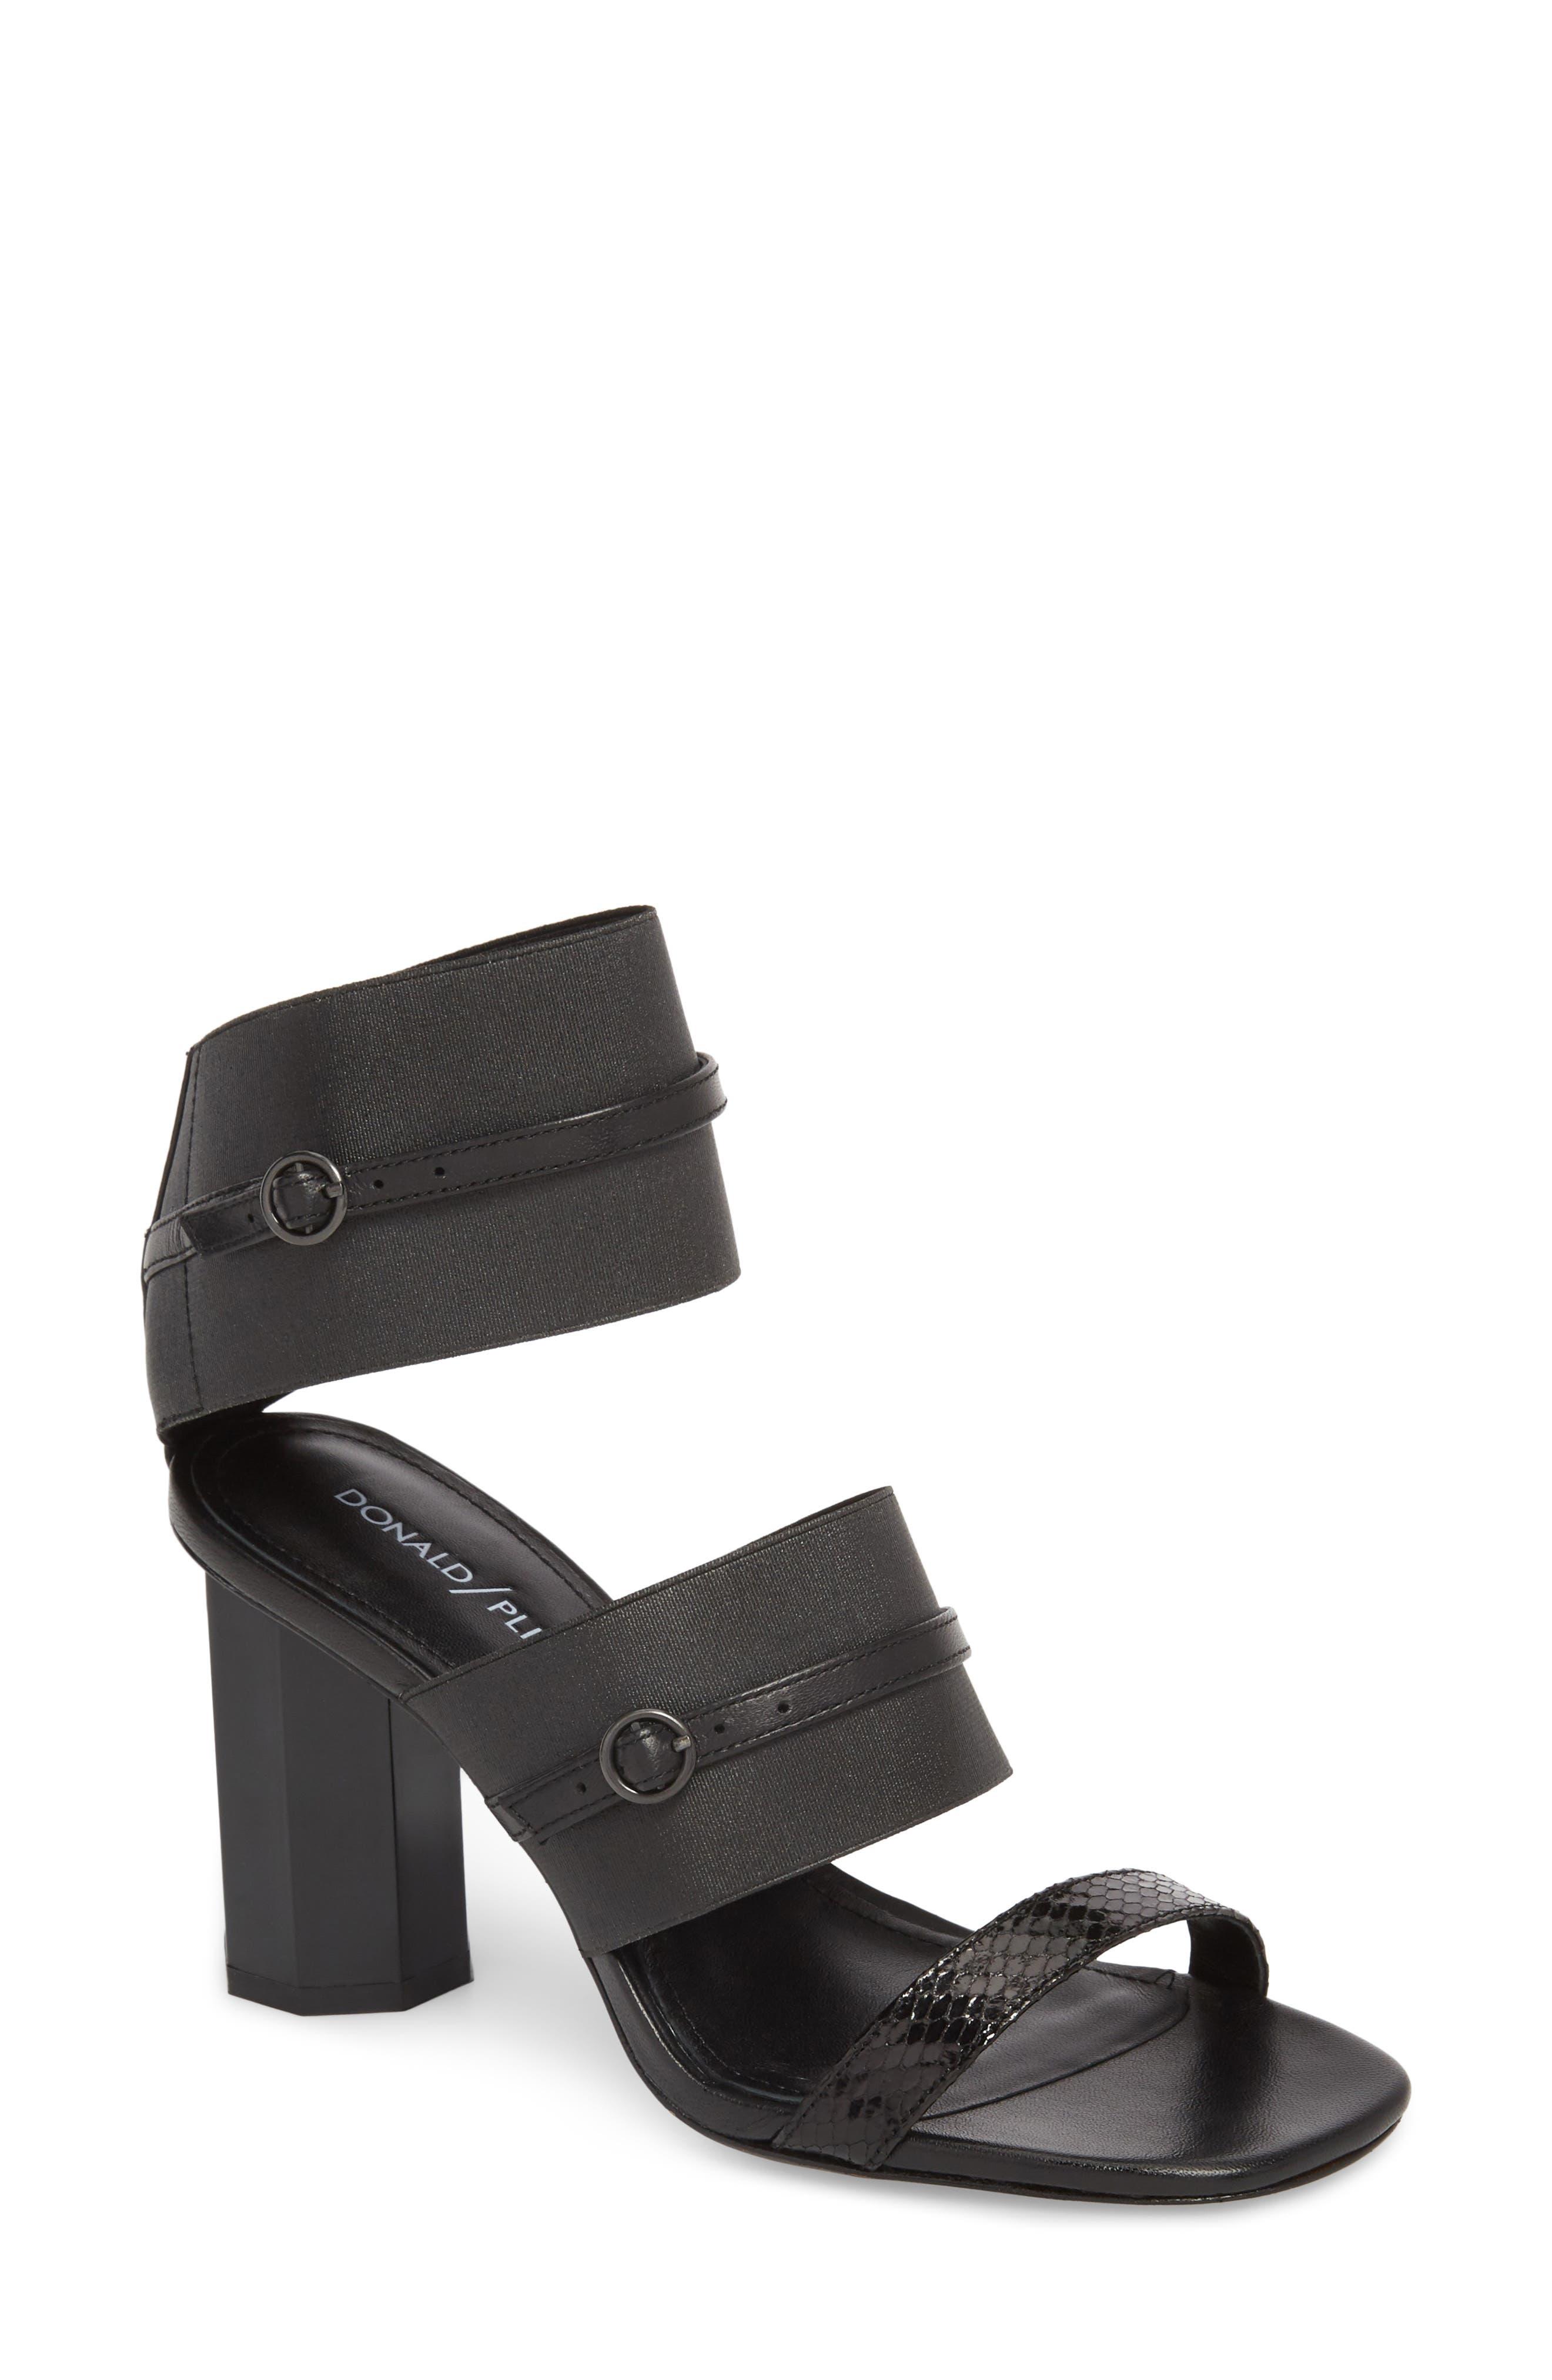 Edie Sandal,                         Main,                         color, Black Leather